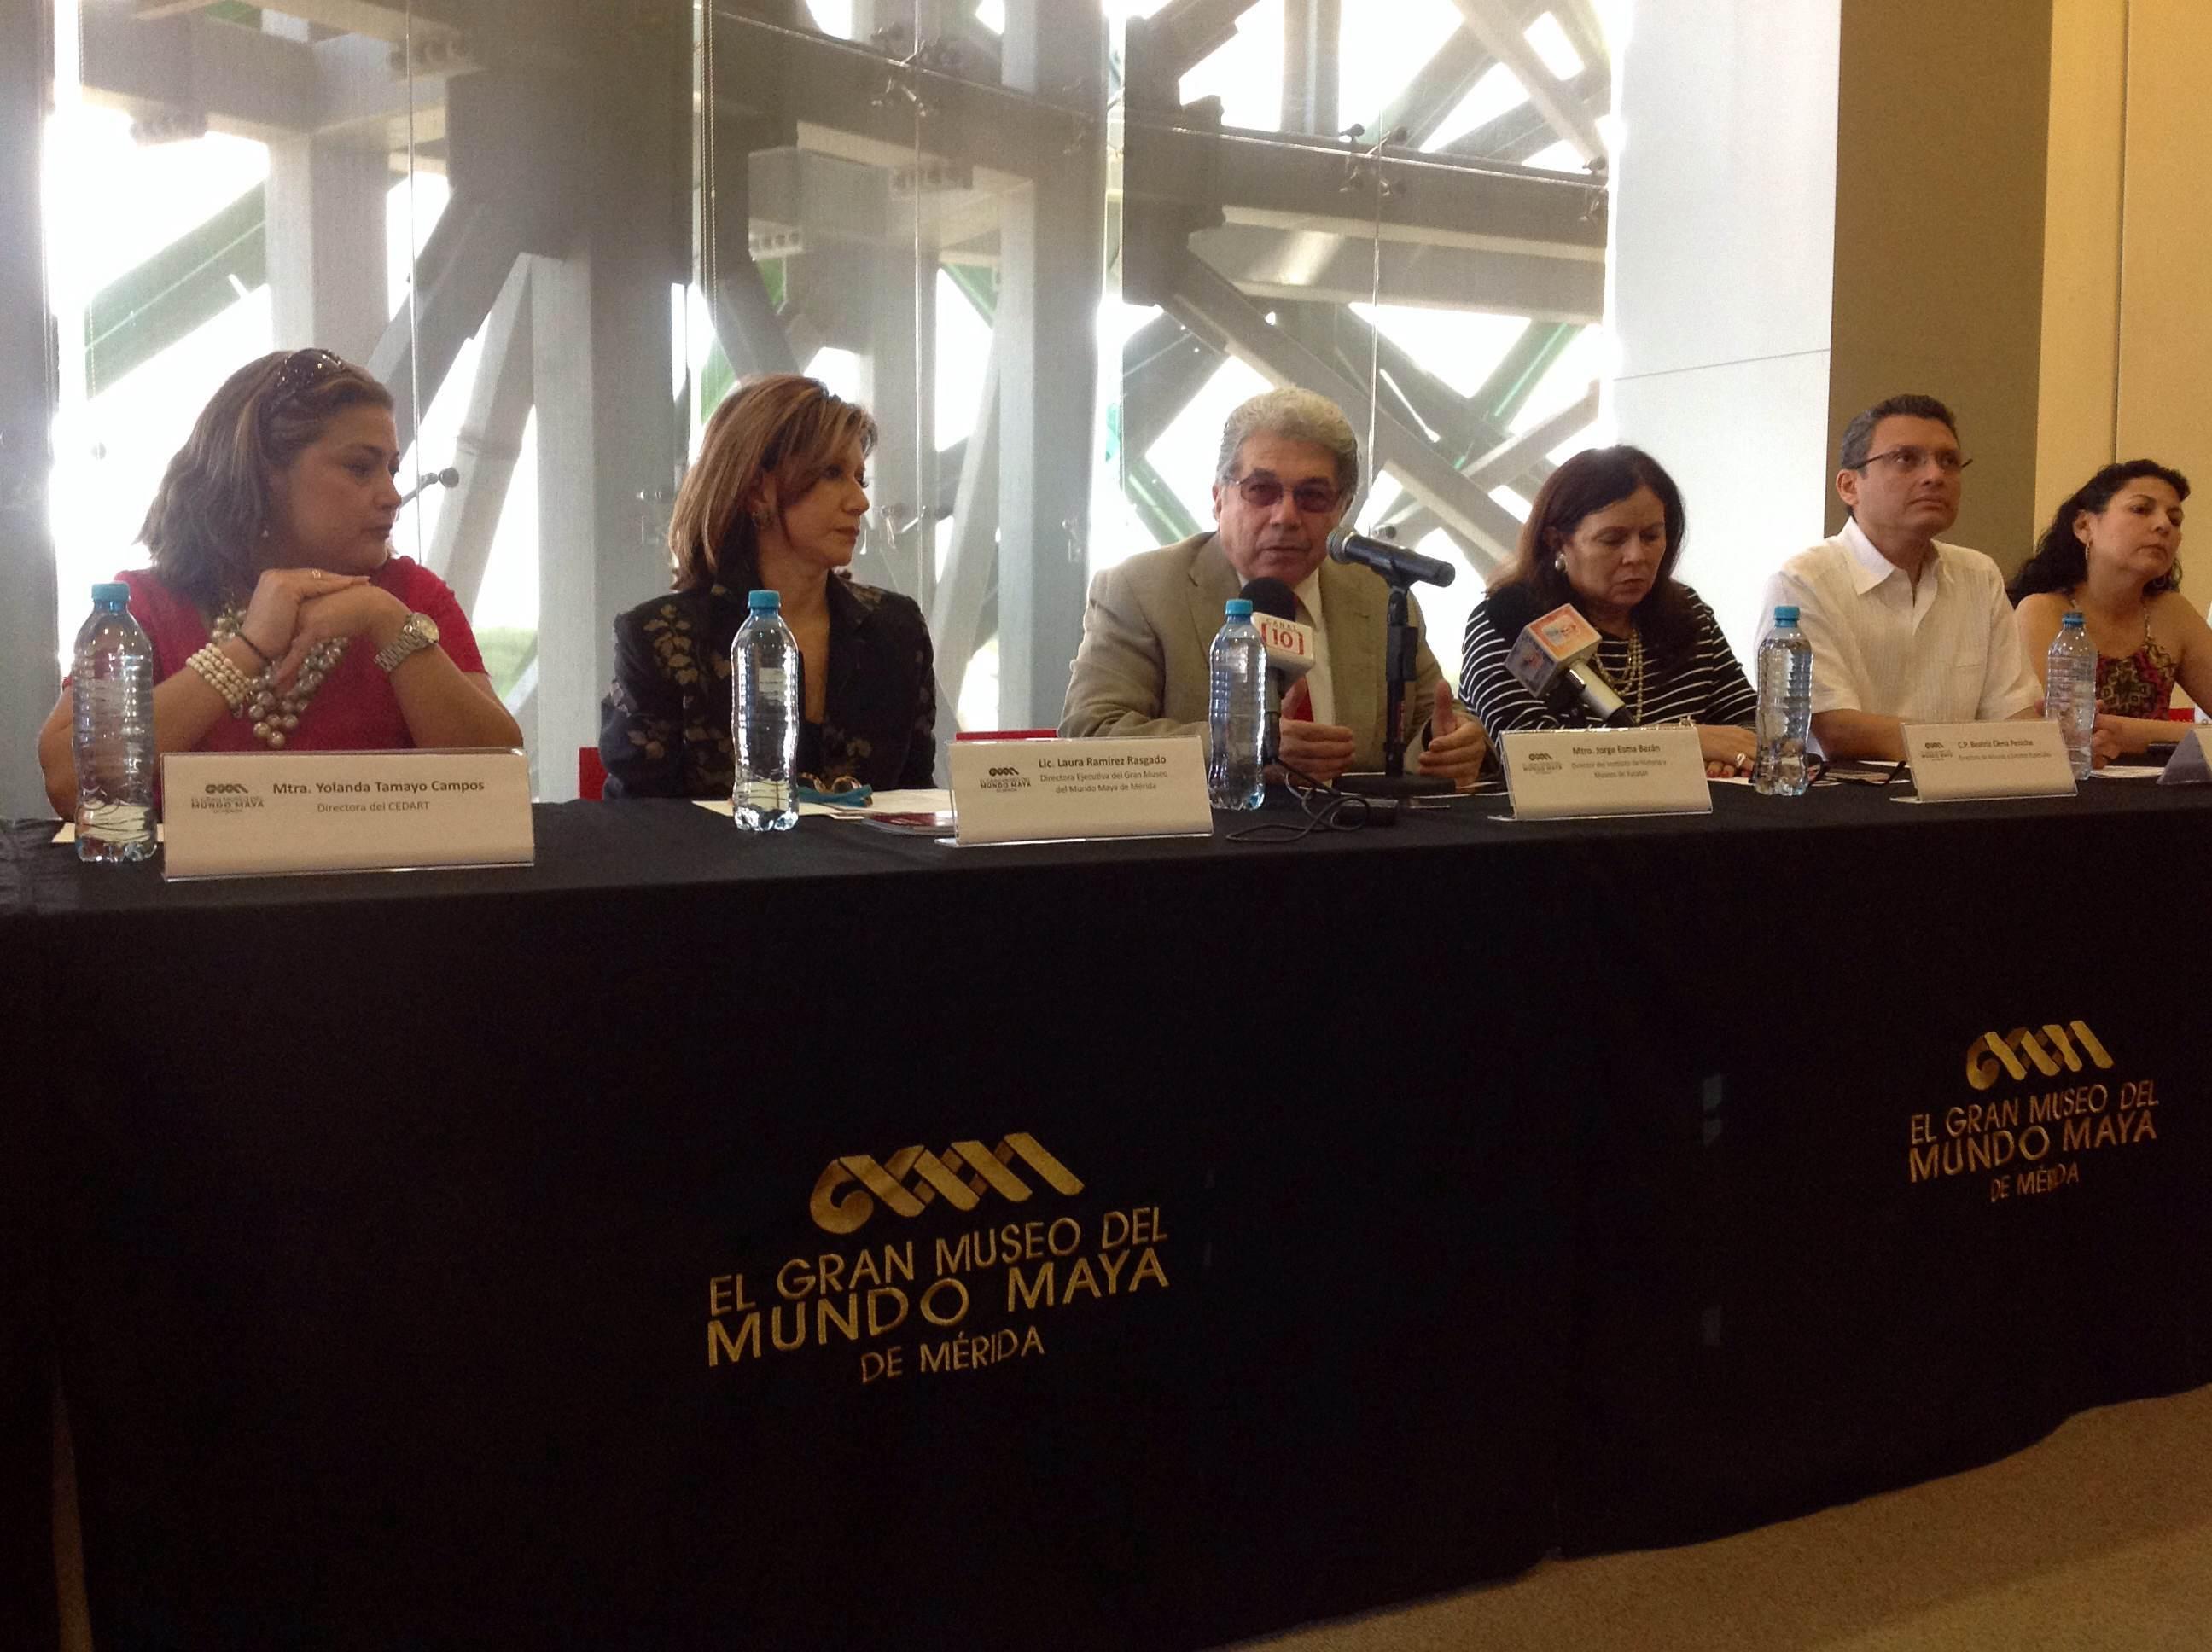 Discusión interminable por Museo Maya, responde a intereses.- Esma